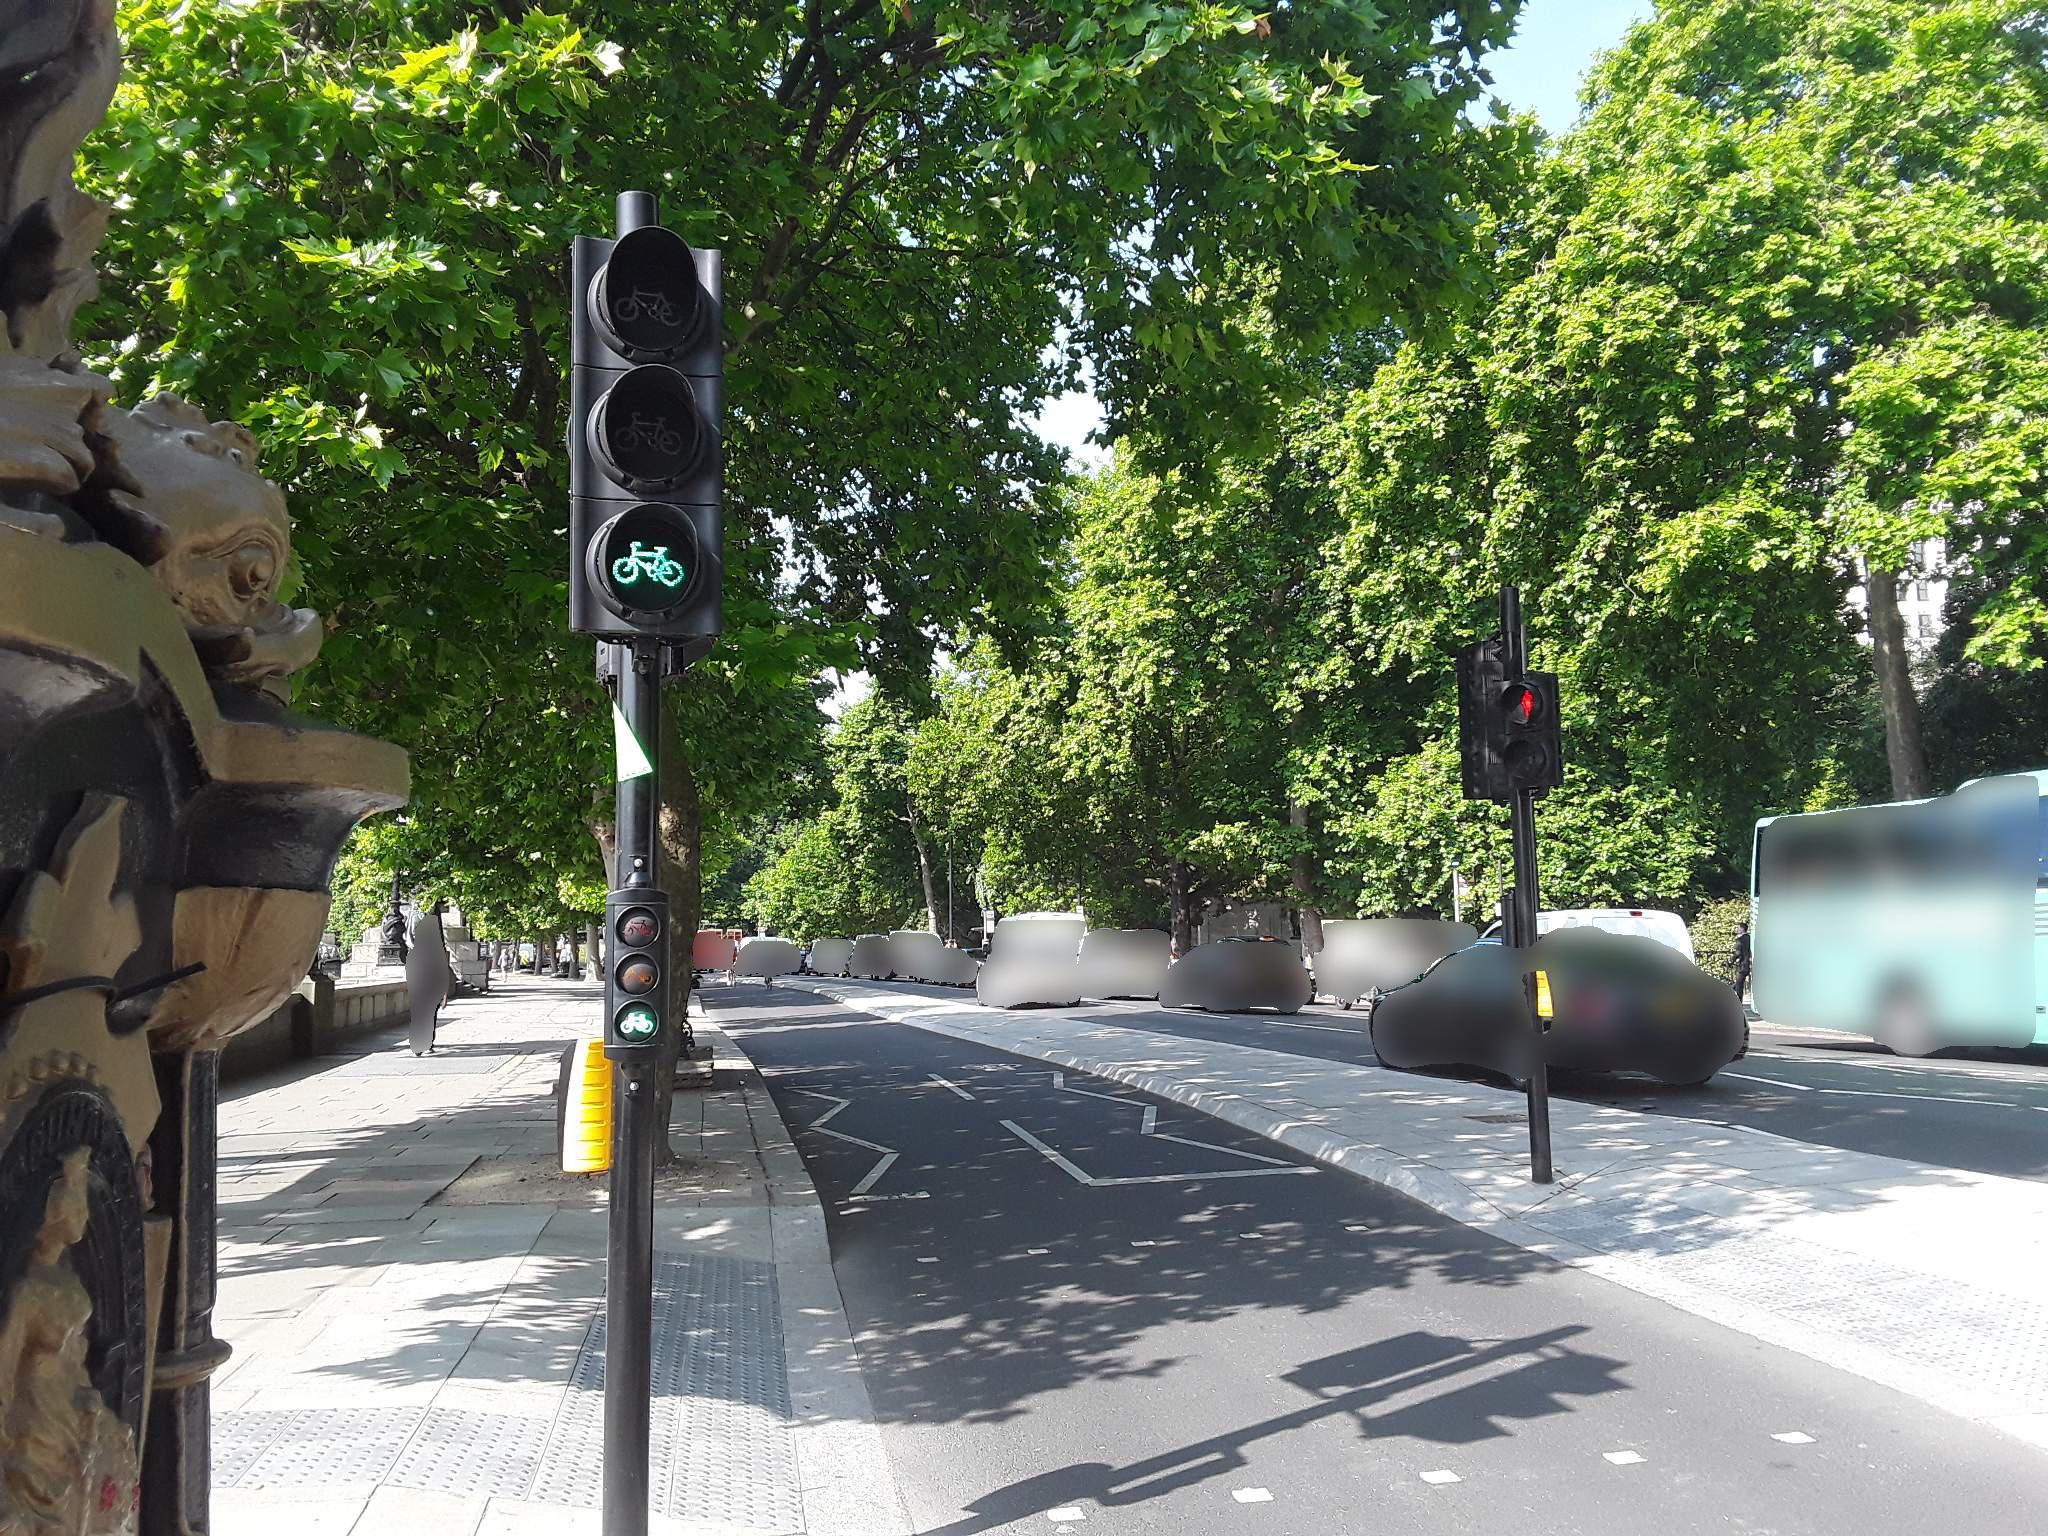 Bike lane infrastructure